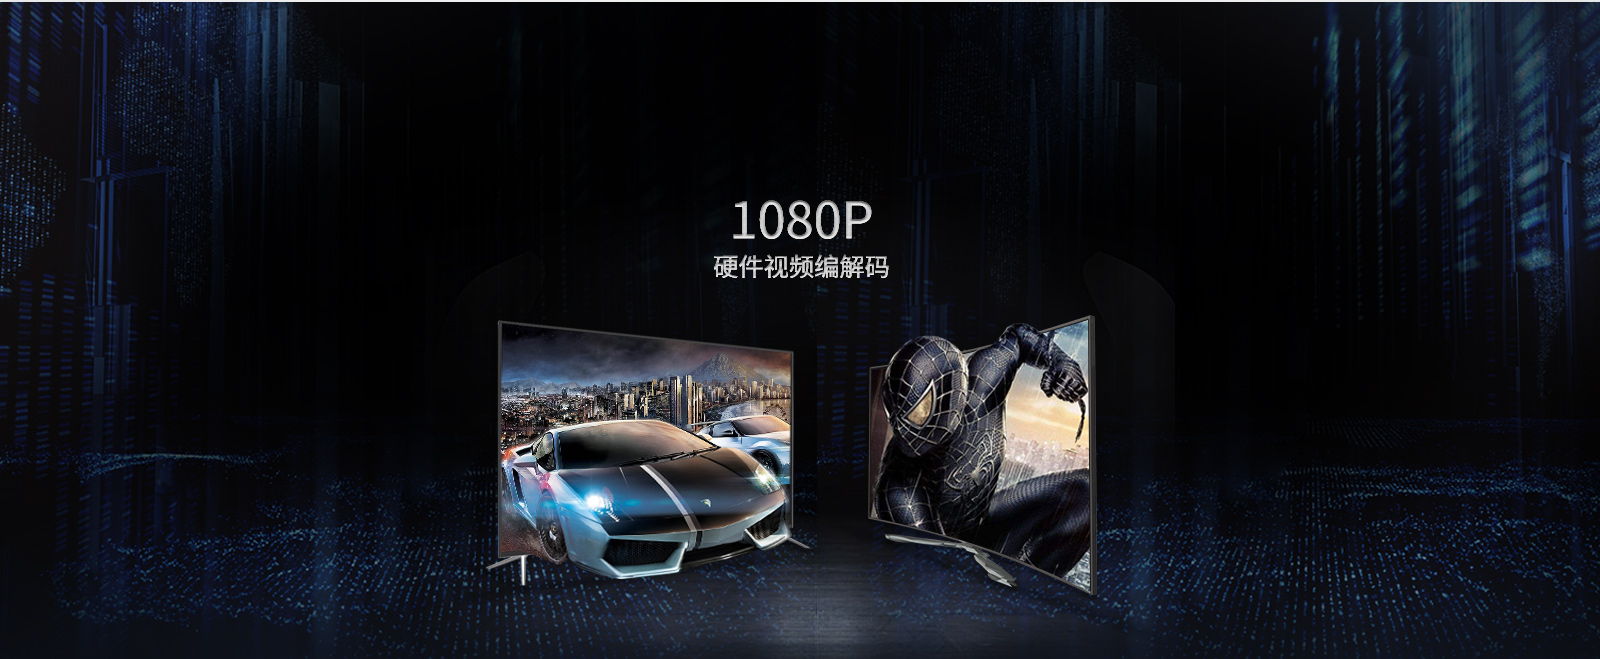 充电zhuang、广gao机、新零售工控机duo媒体ying用